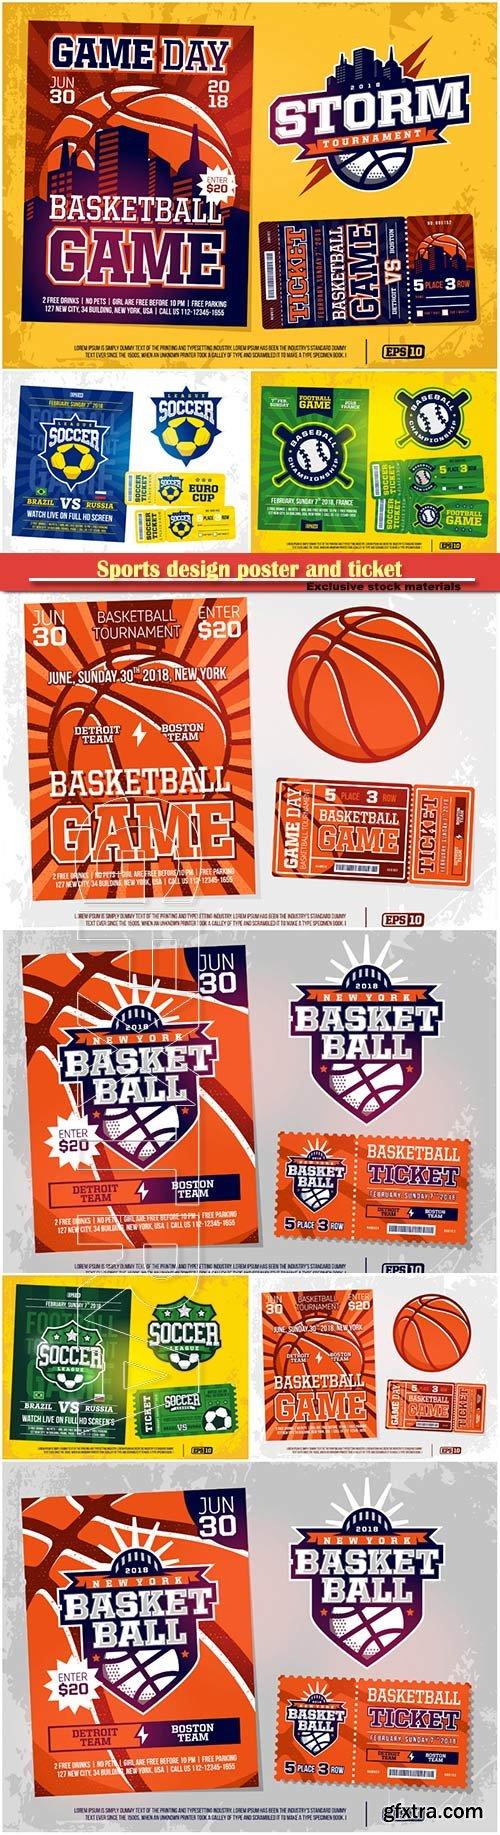 Sports design poster and ticket and emblem for baseball, soccer, basebal